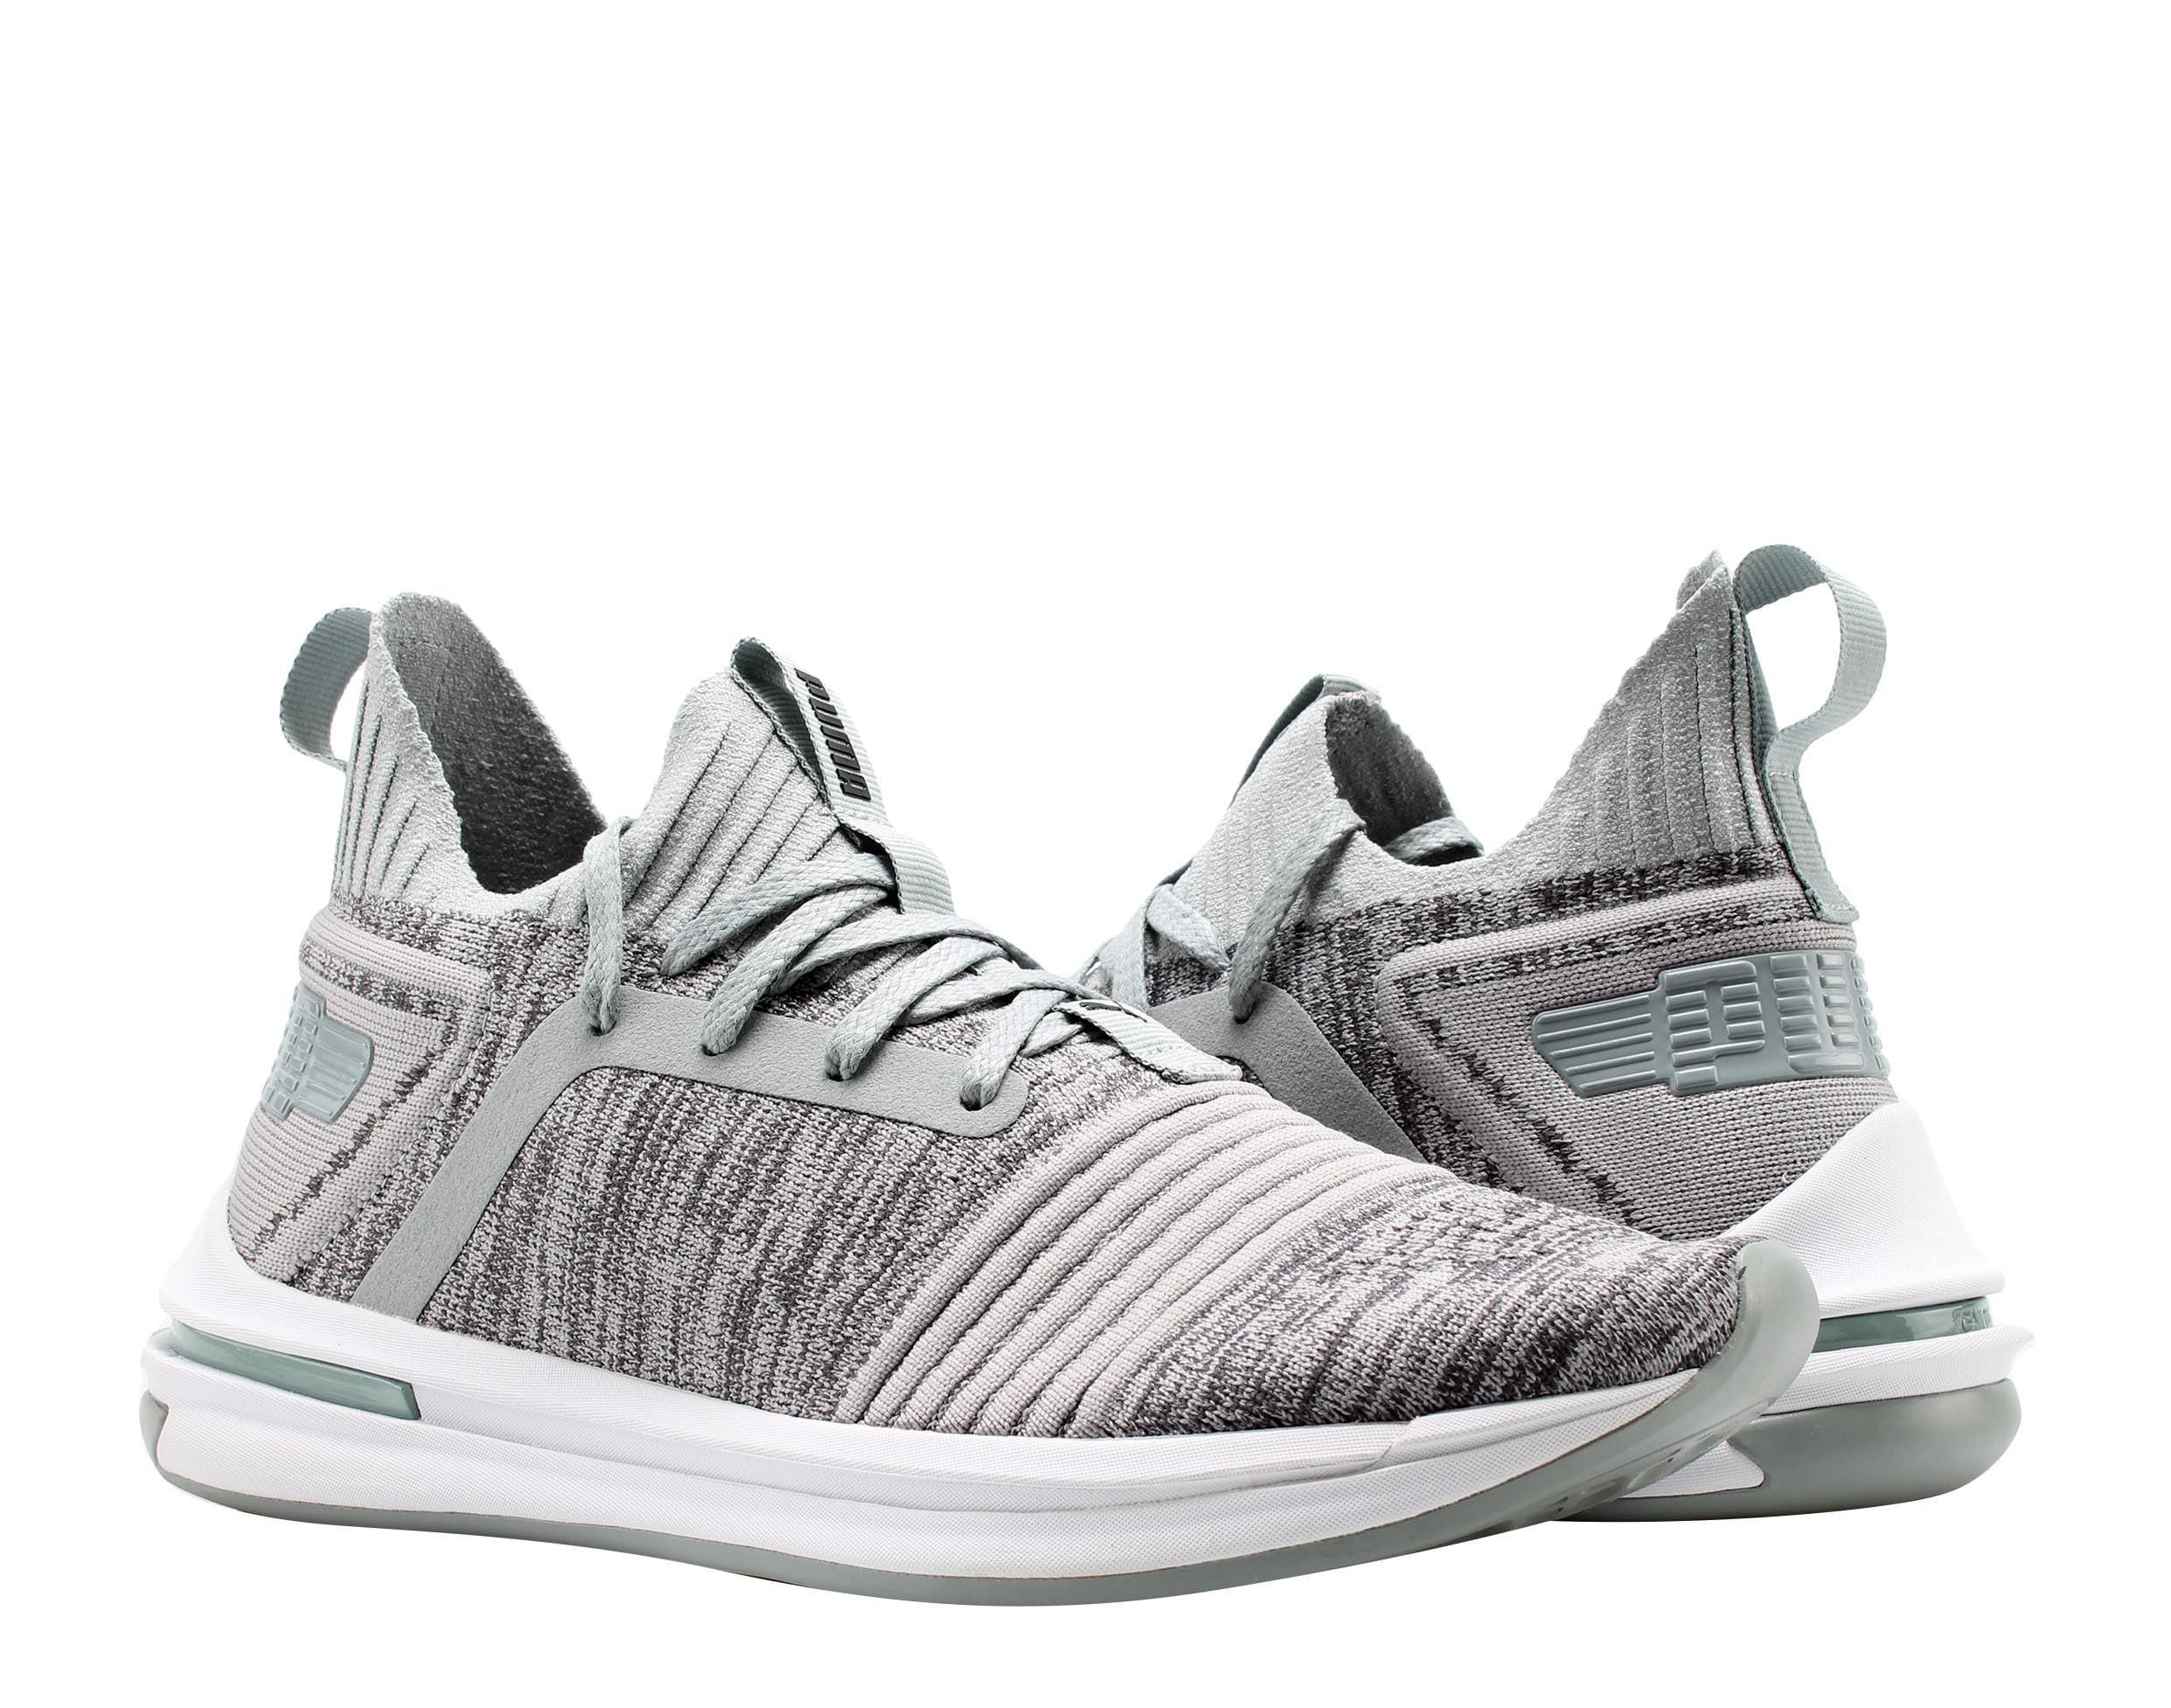 5f2272cbccfe98 PUMA - Puma IGNITE Limitless SR EvoKnit Quarry Grey Men s Running Shoes  19048404 - Walmart.com